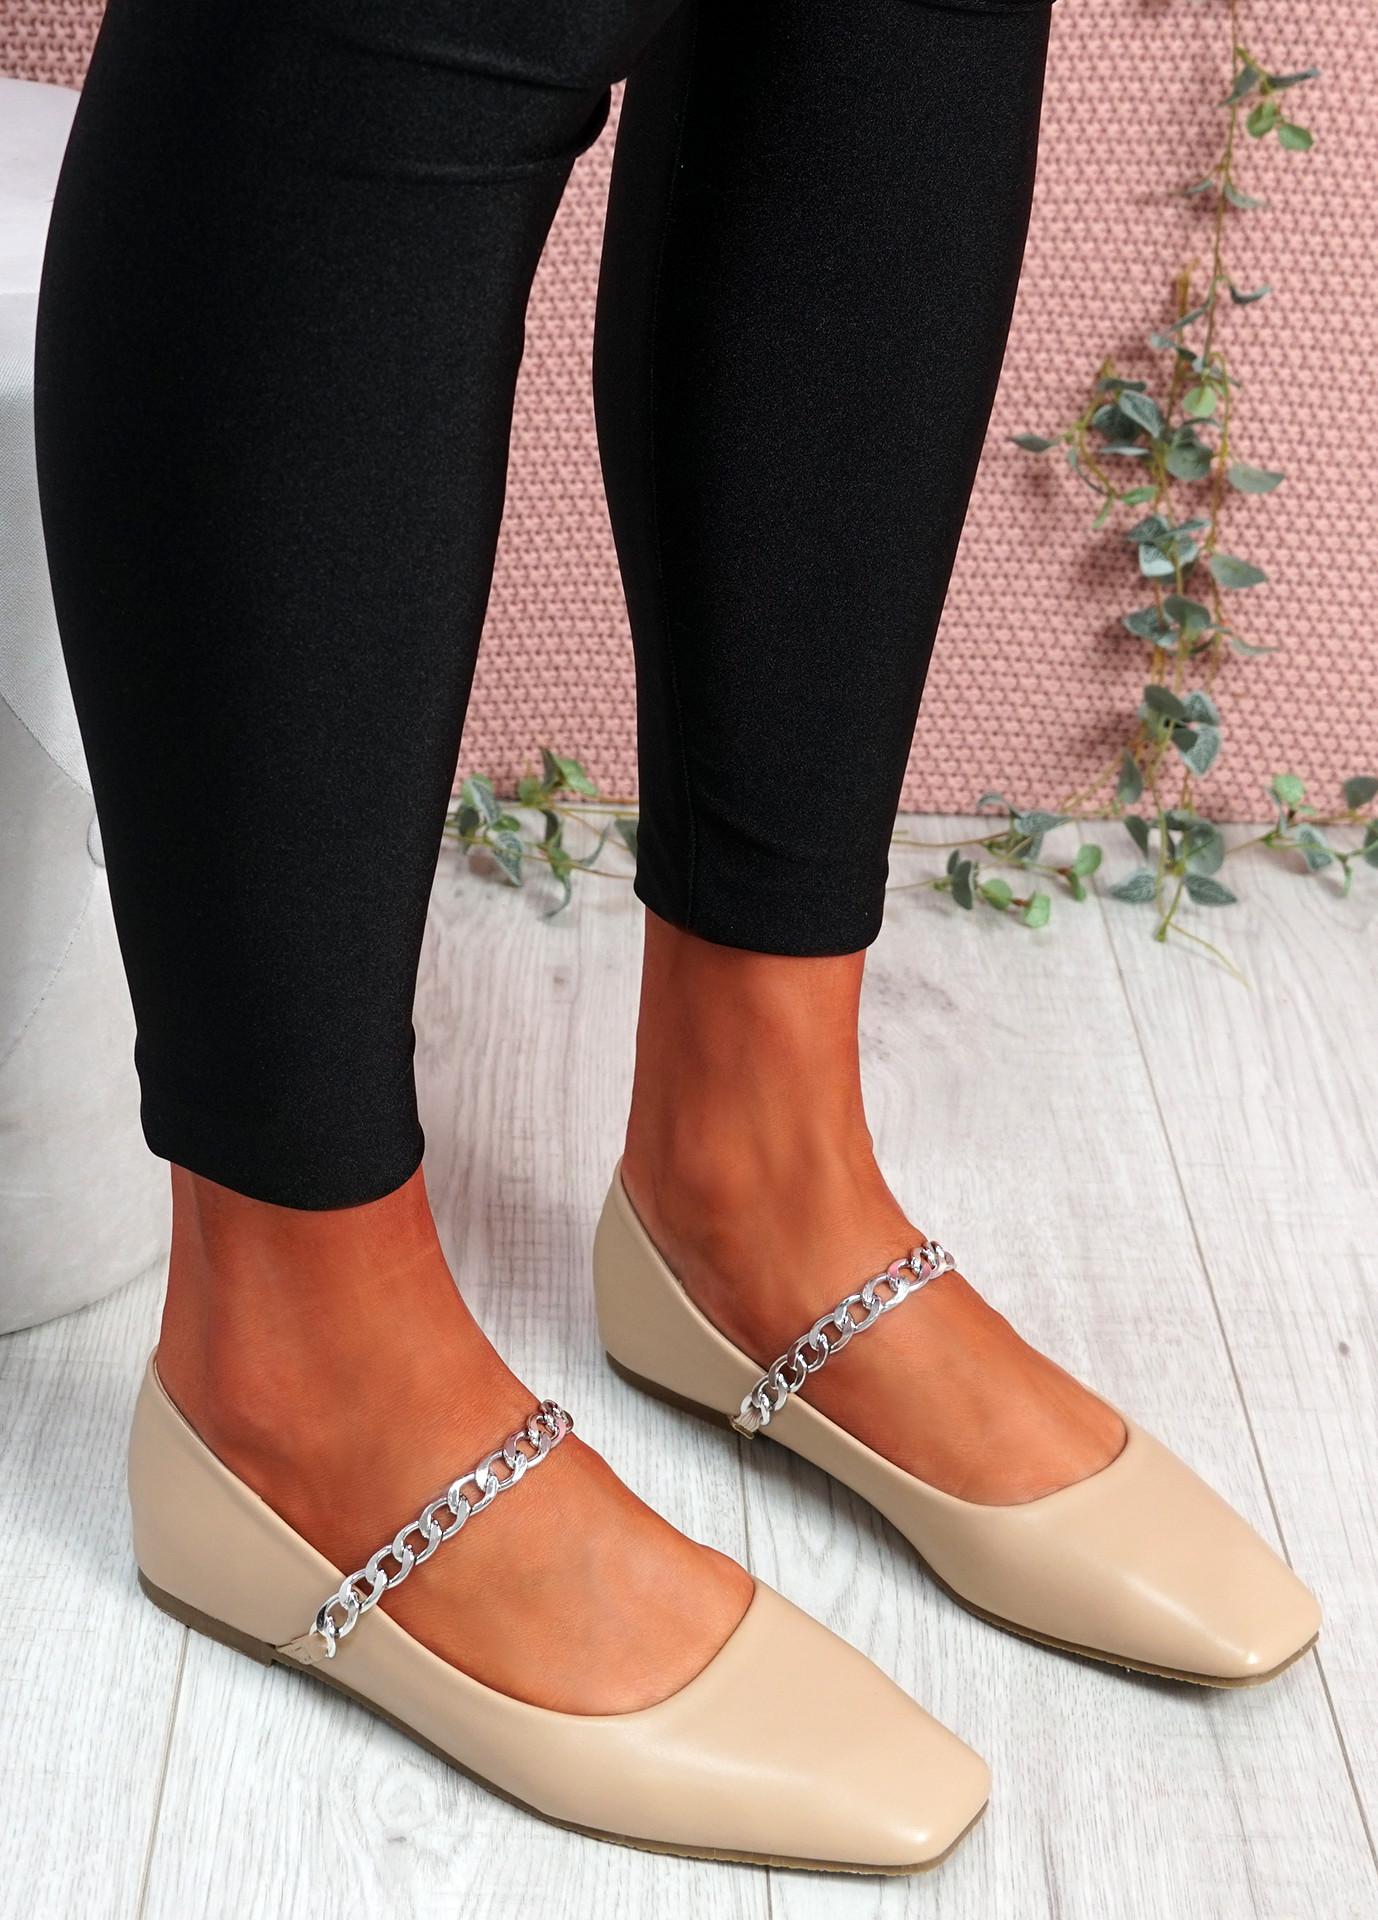 Binna Chain Apricot Ballerinas